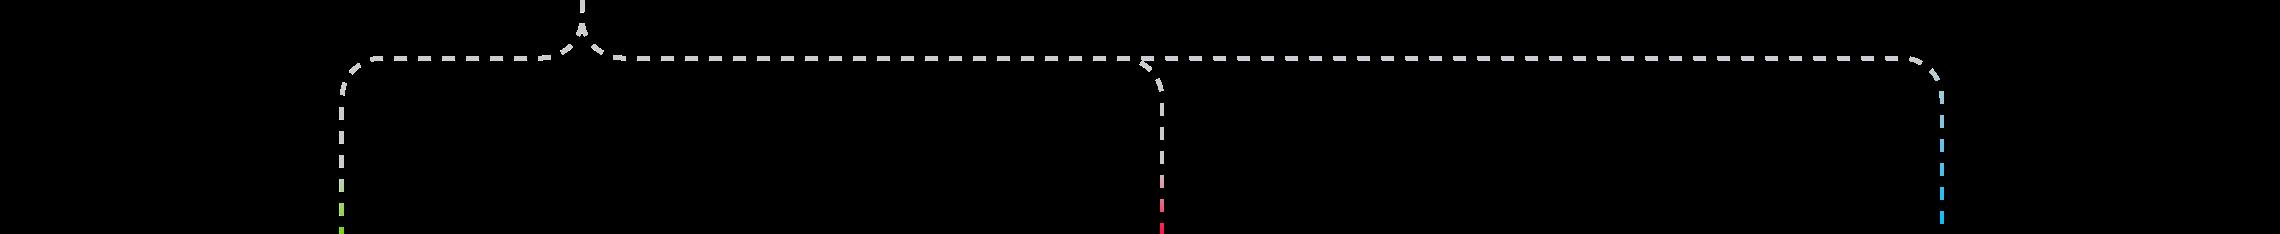 result-lines